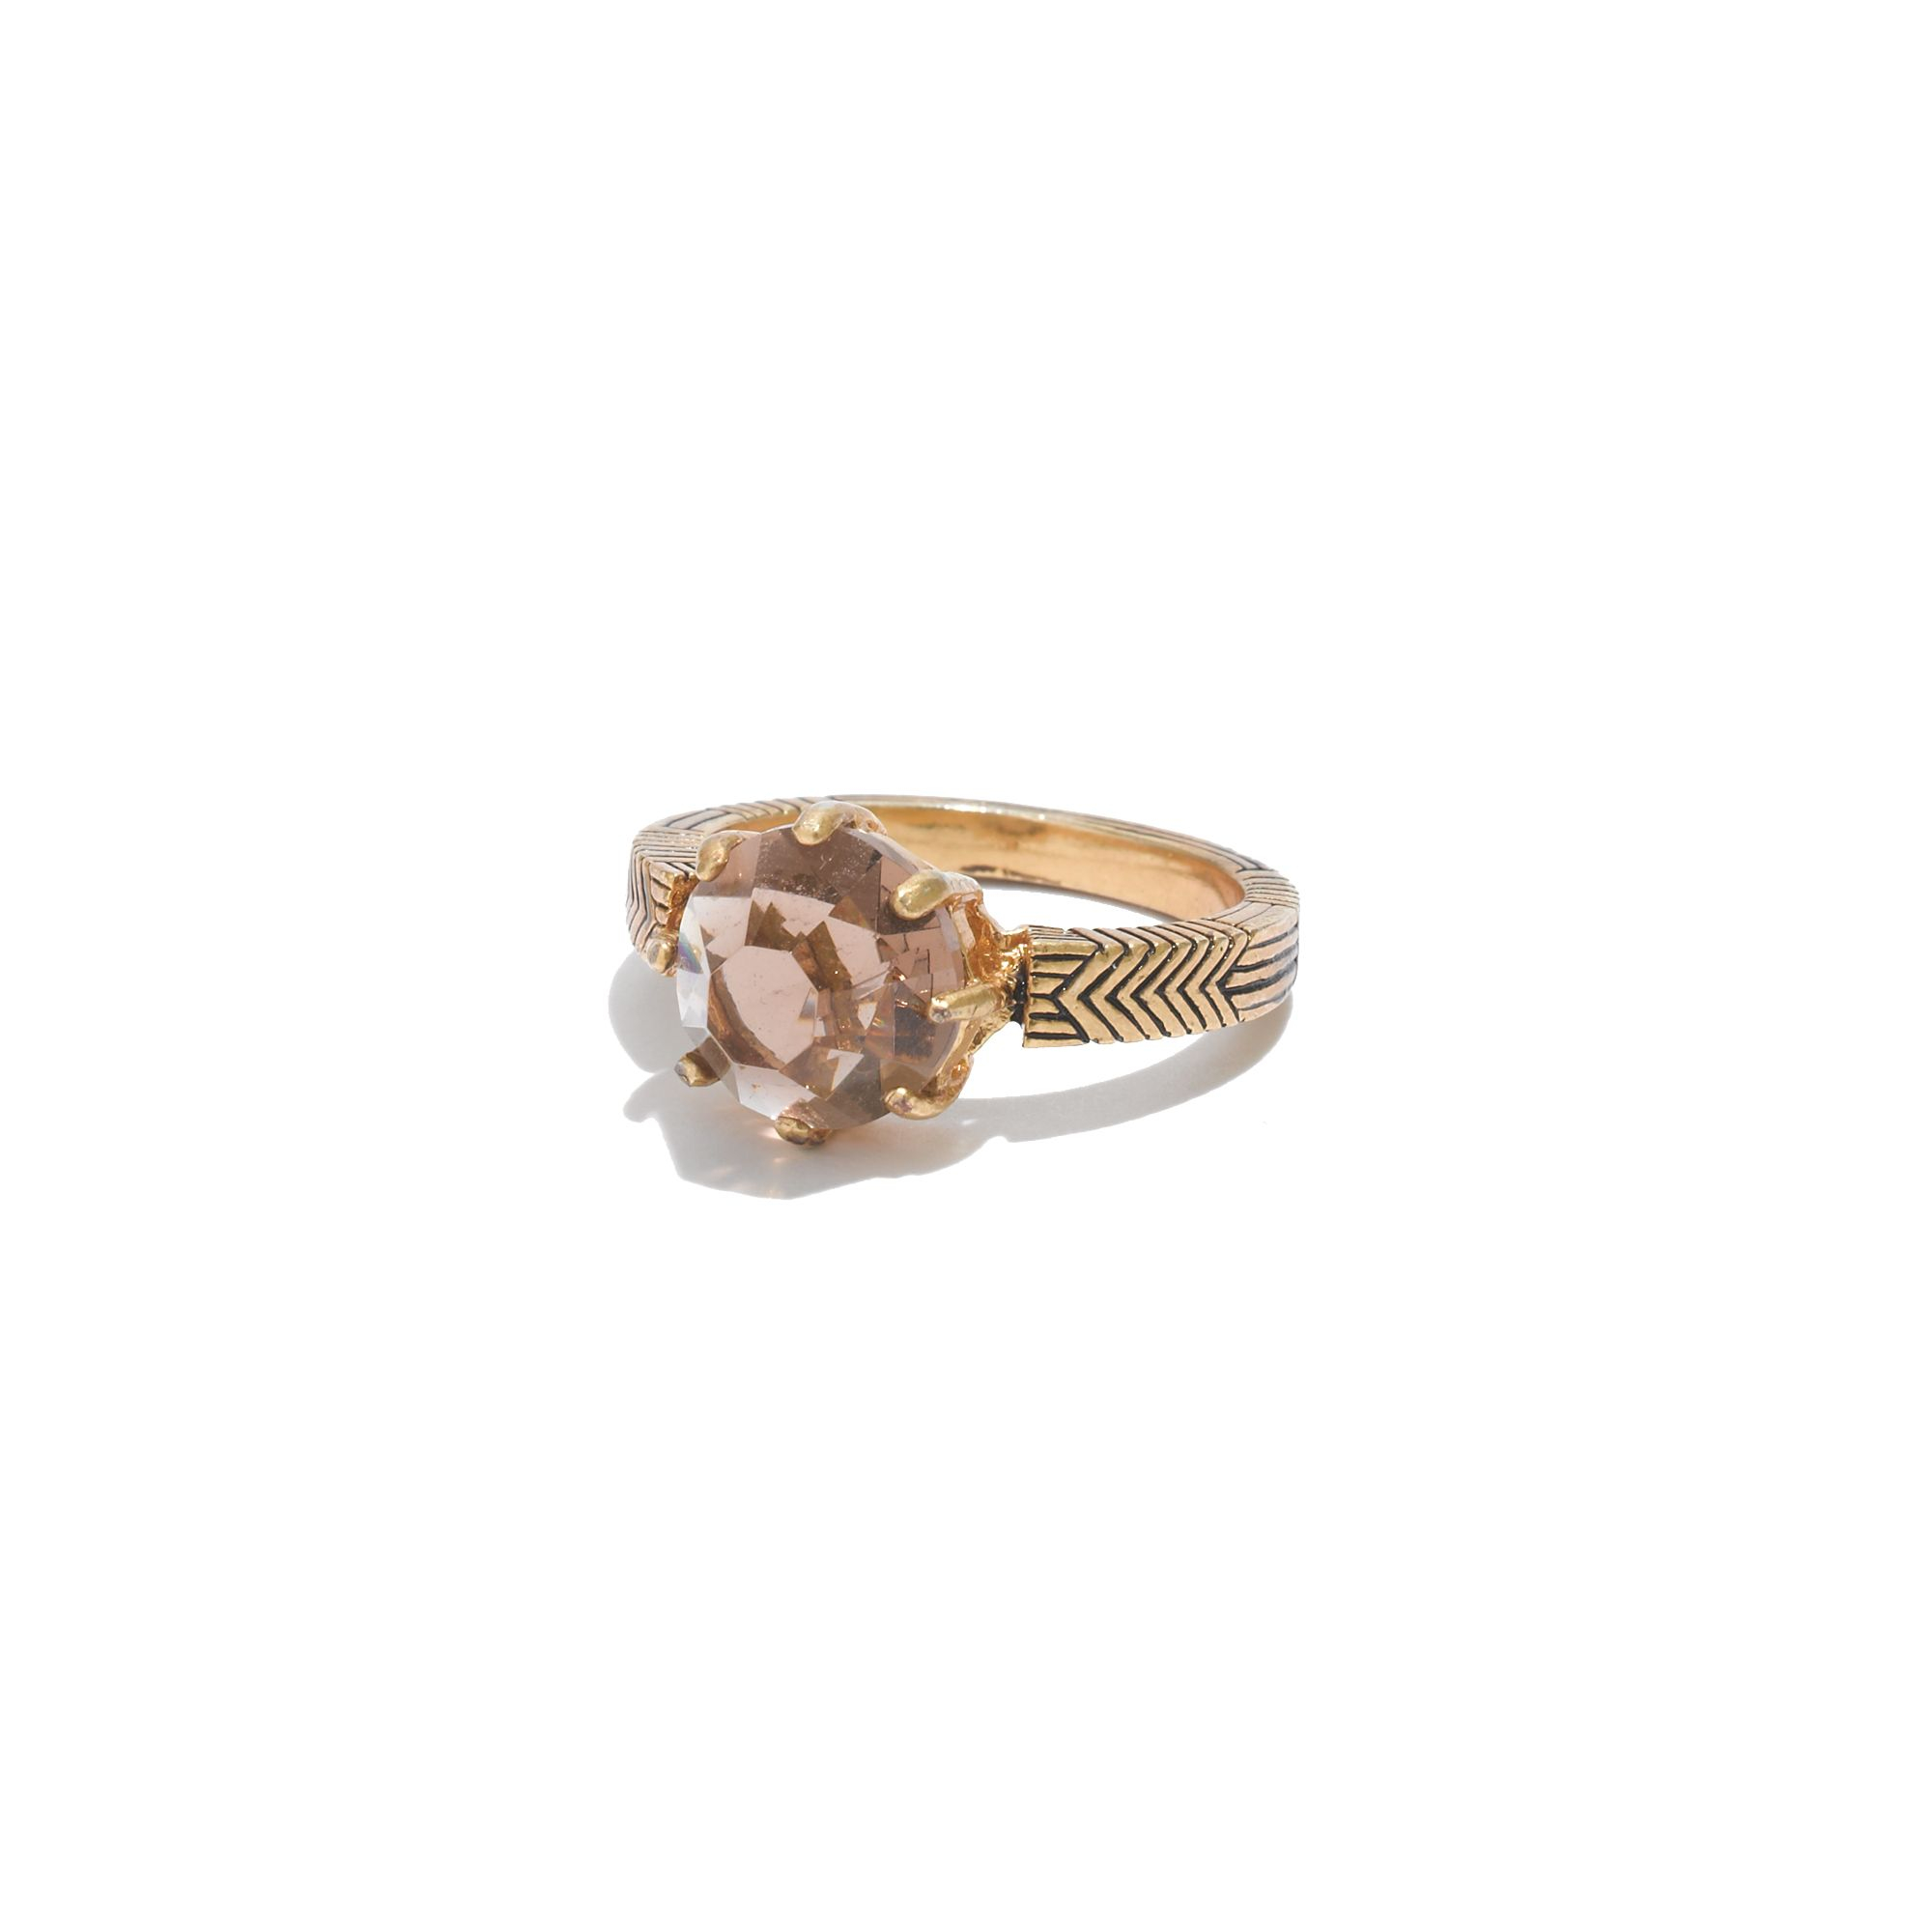 Madewell Smokestone Ring in Vintage Gold (Metallic)